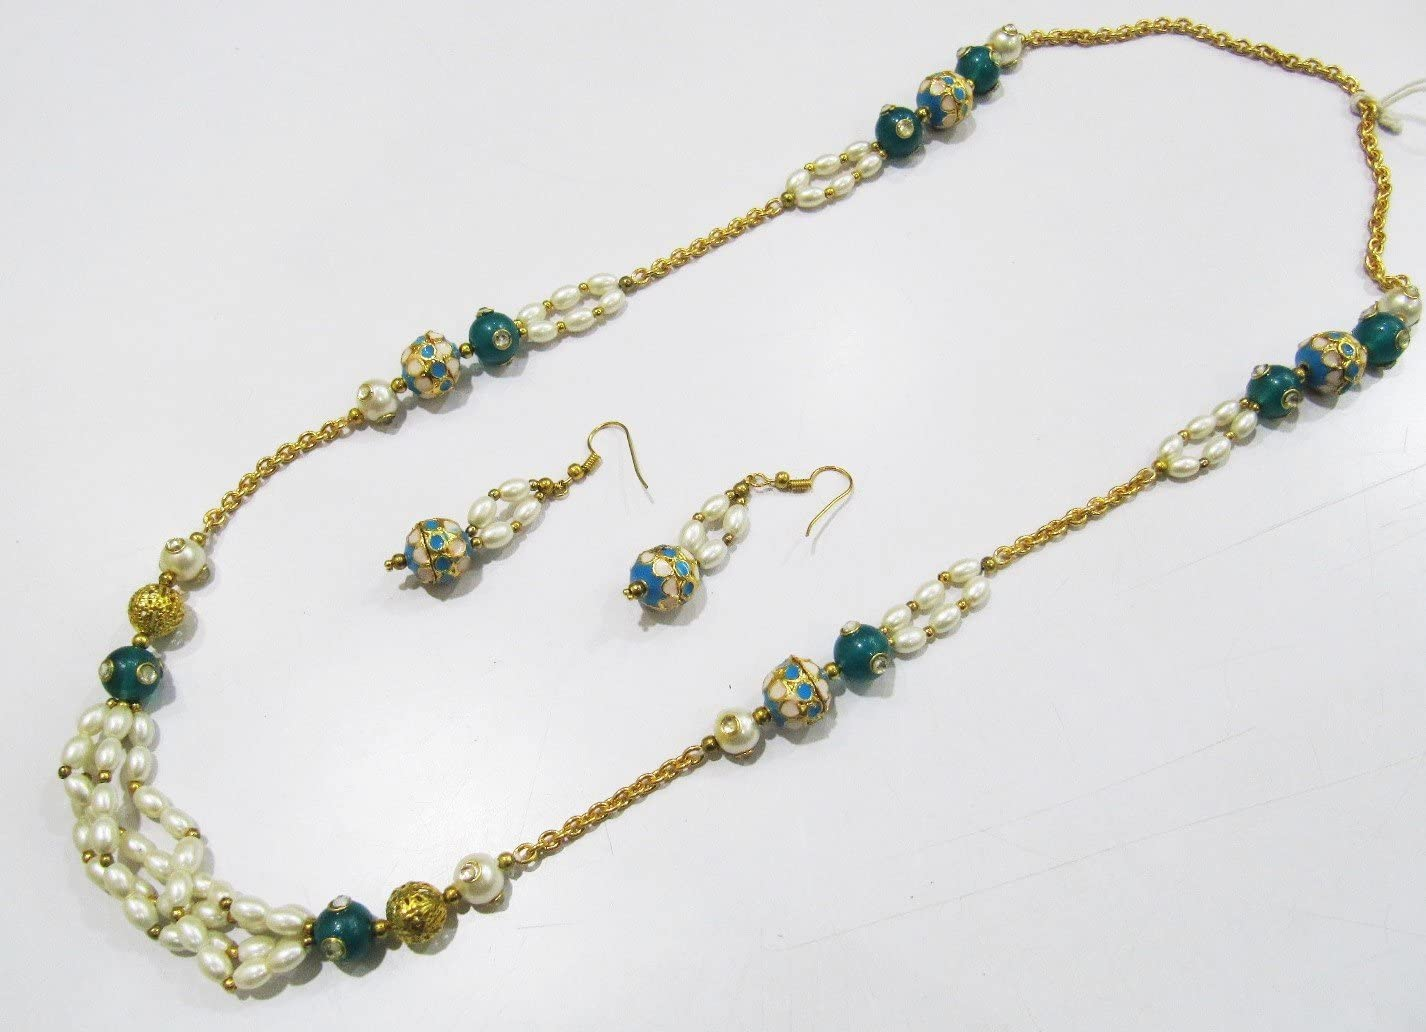 Handmade Designer Seed Beaded Multi Row Necklace Unique Stylish bijouterie